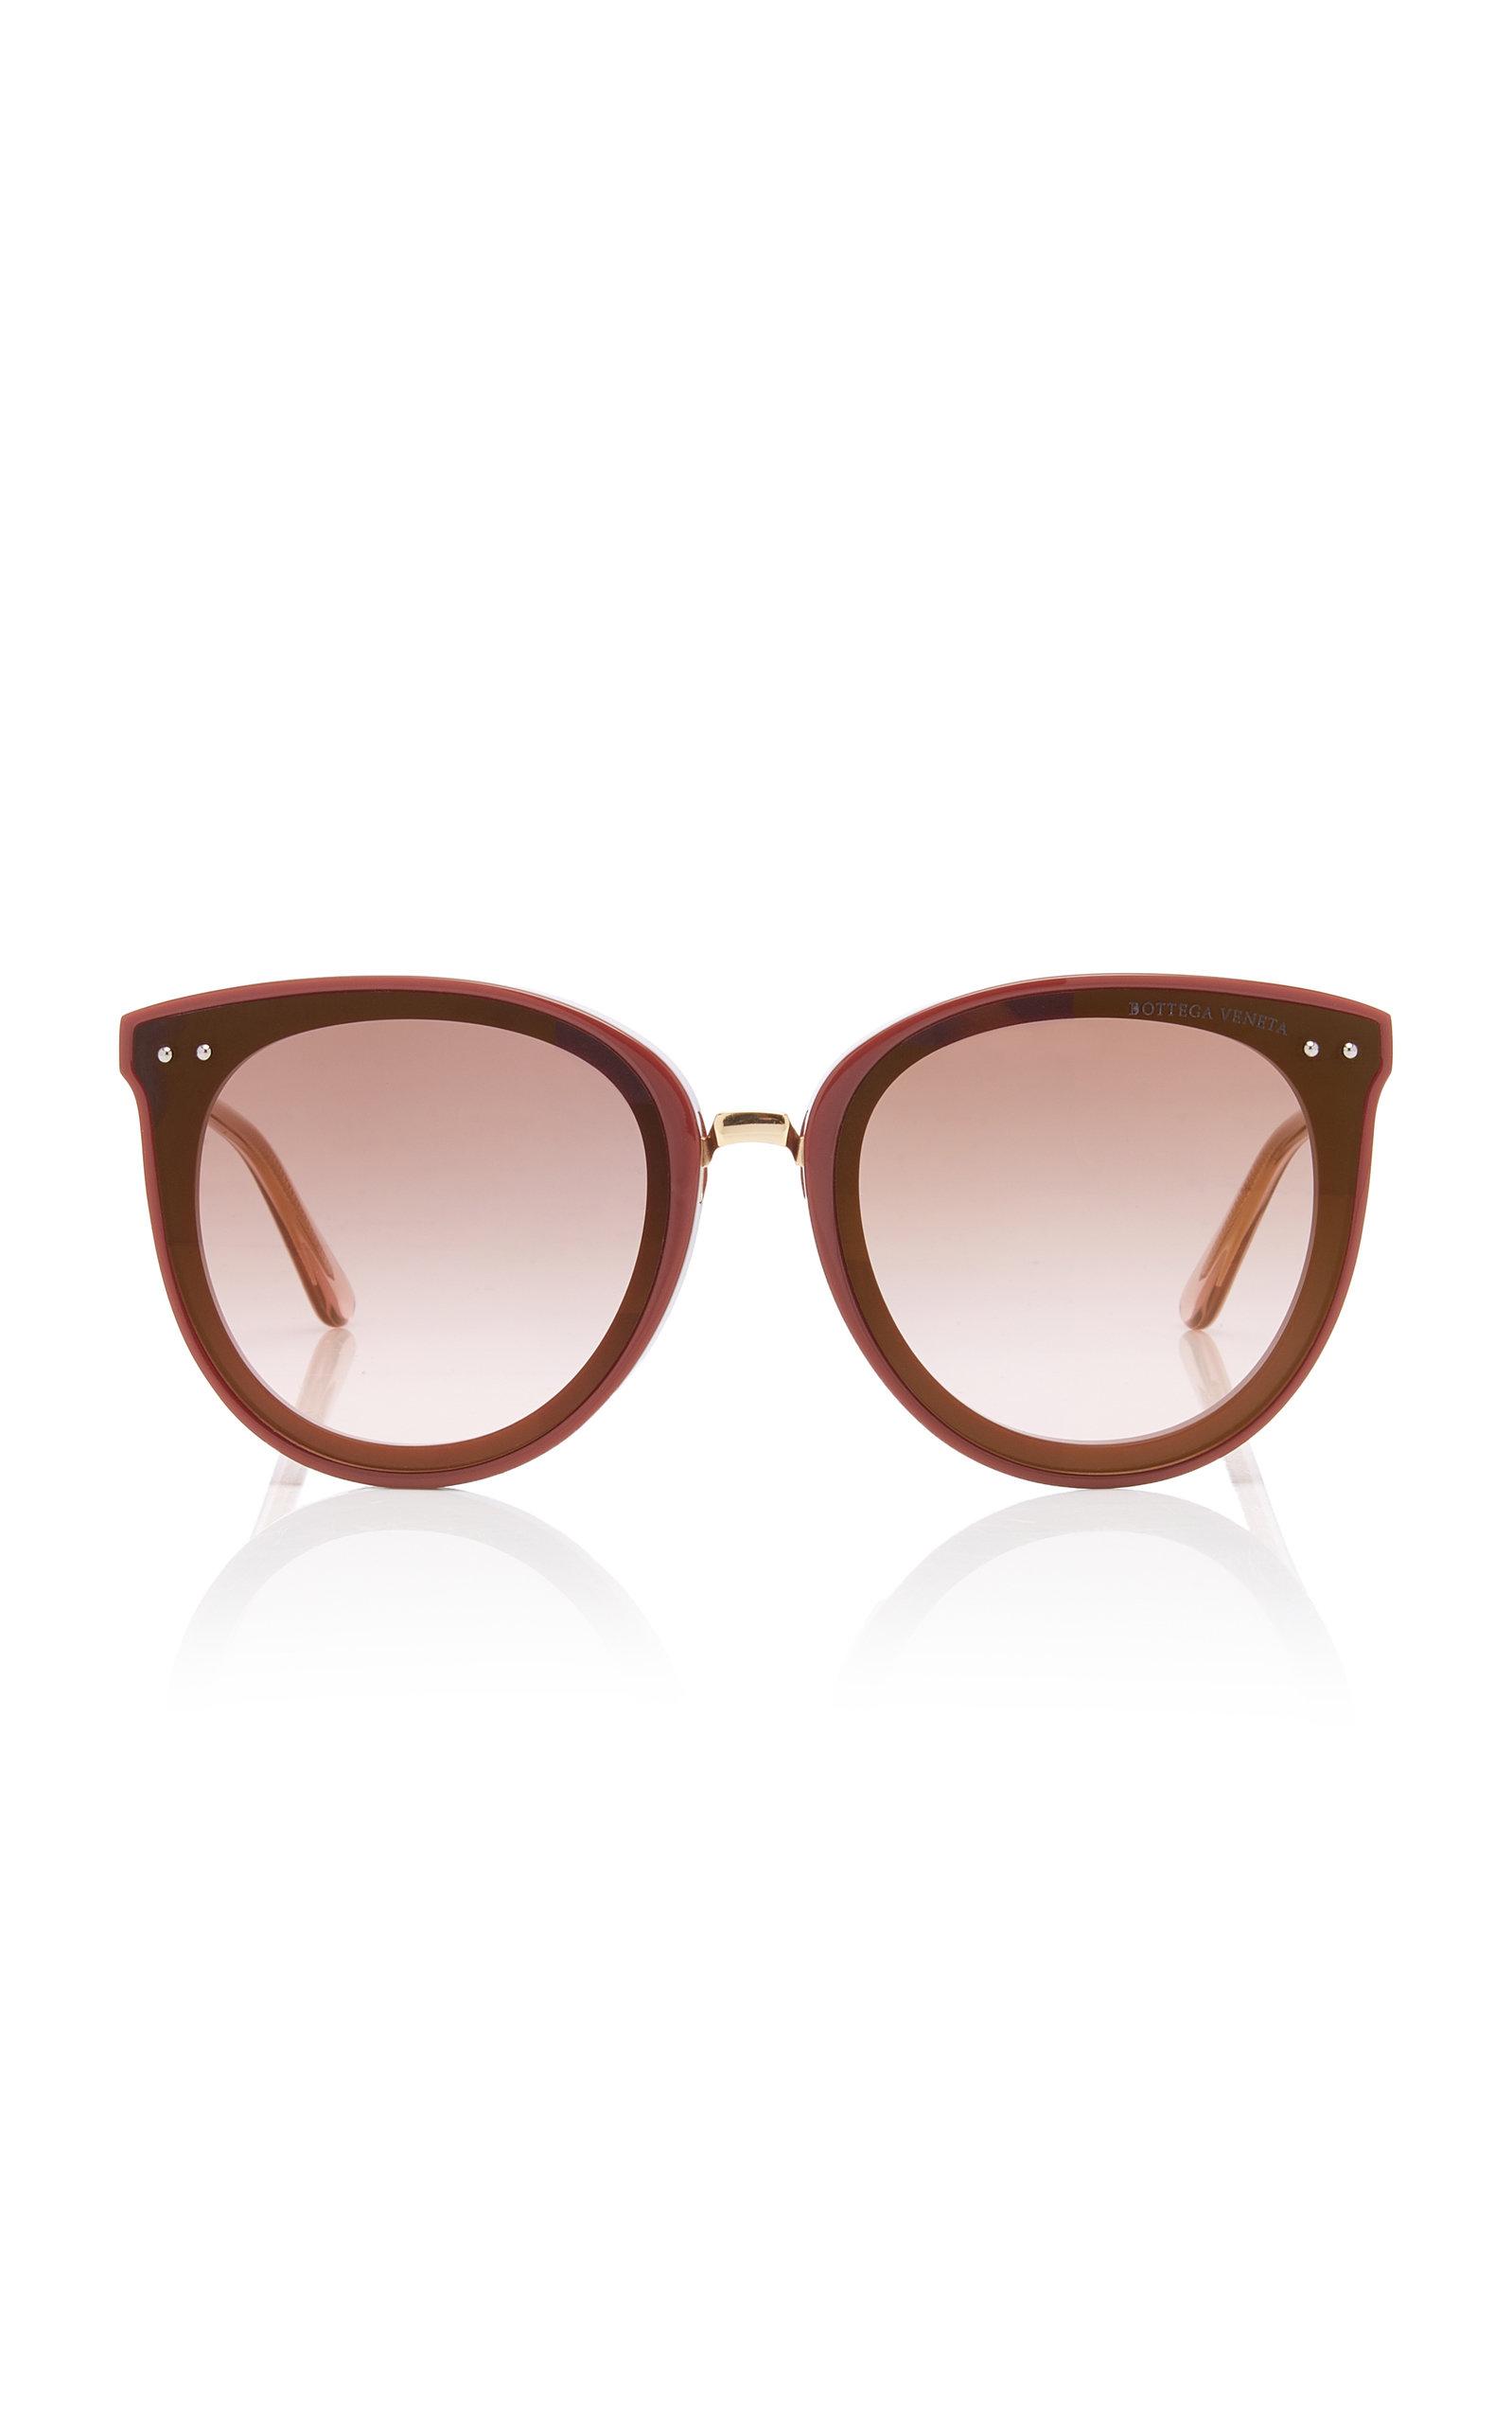 96d016e7d Acetate Cat-Eye Sunglasses by Bottega Veneta Sunglasses | Moda Operandi